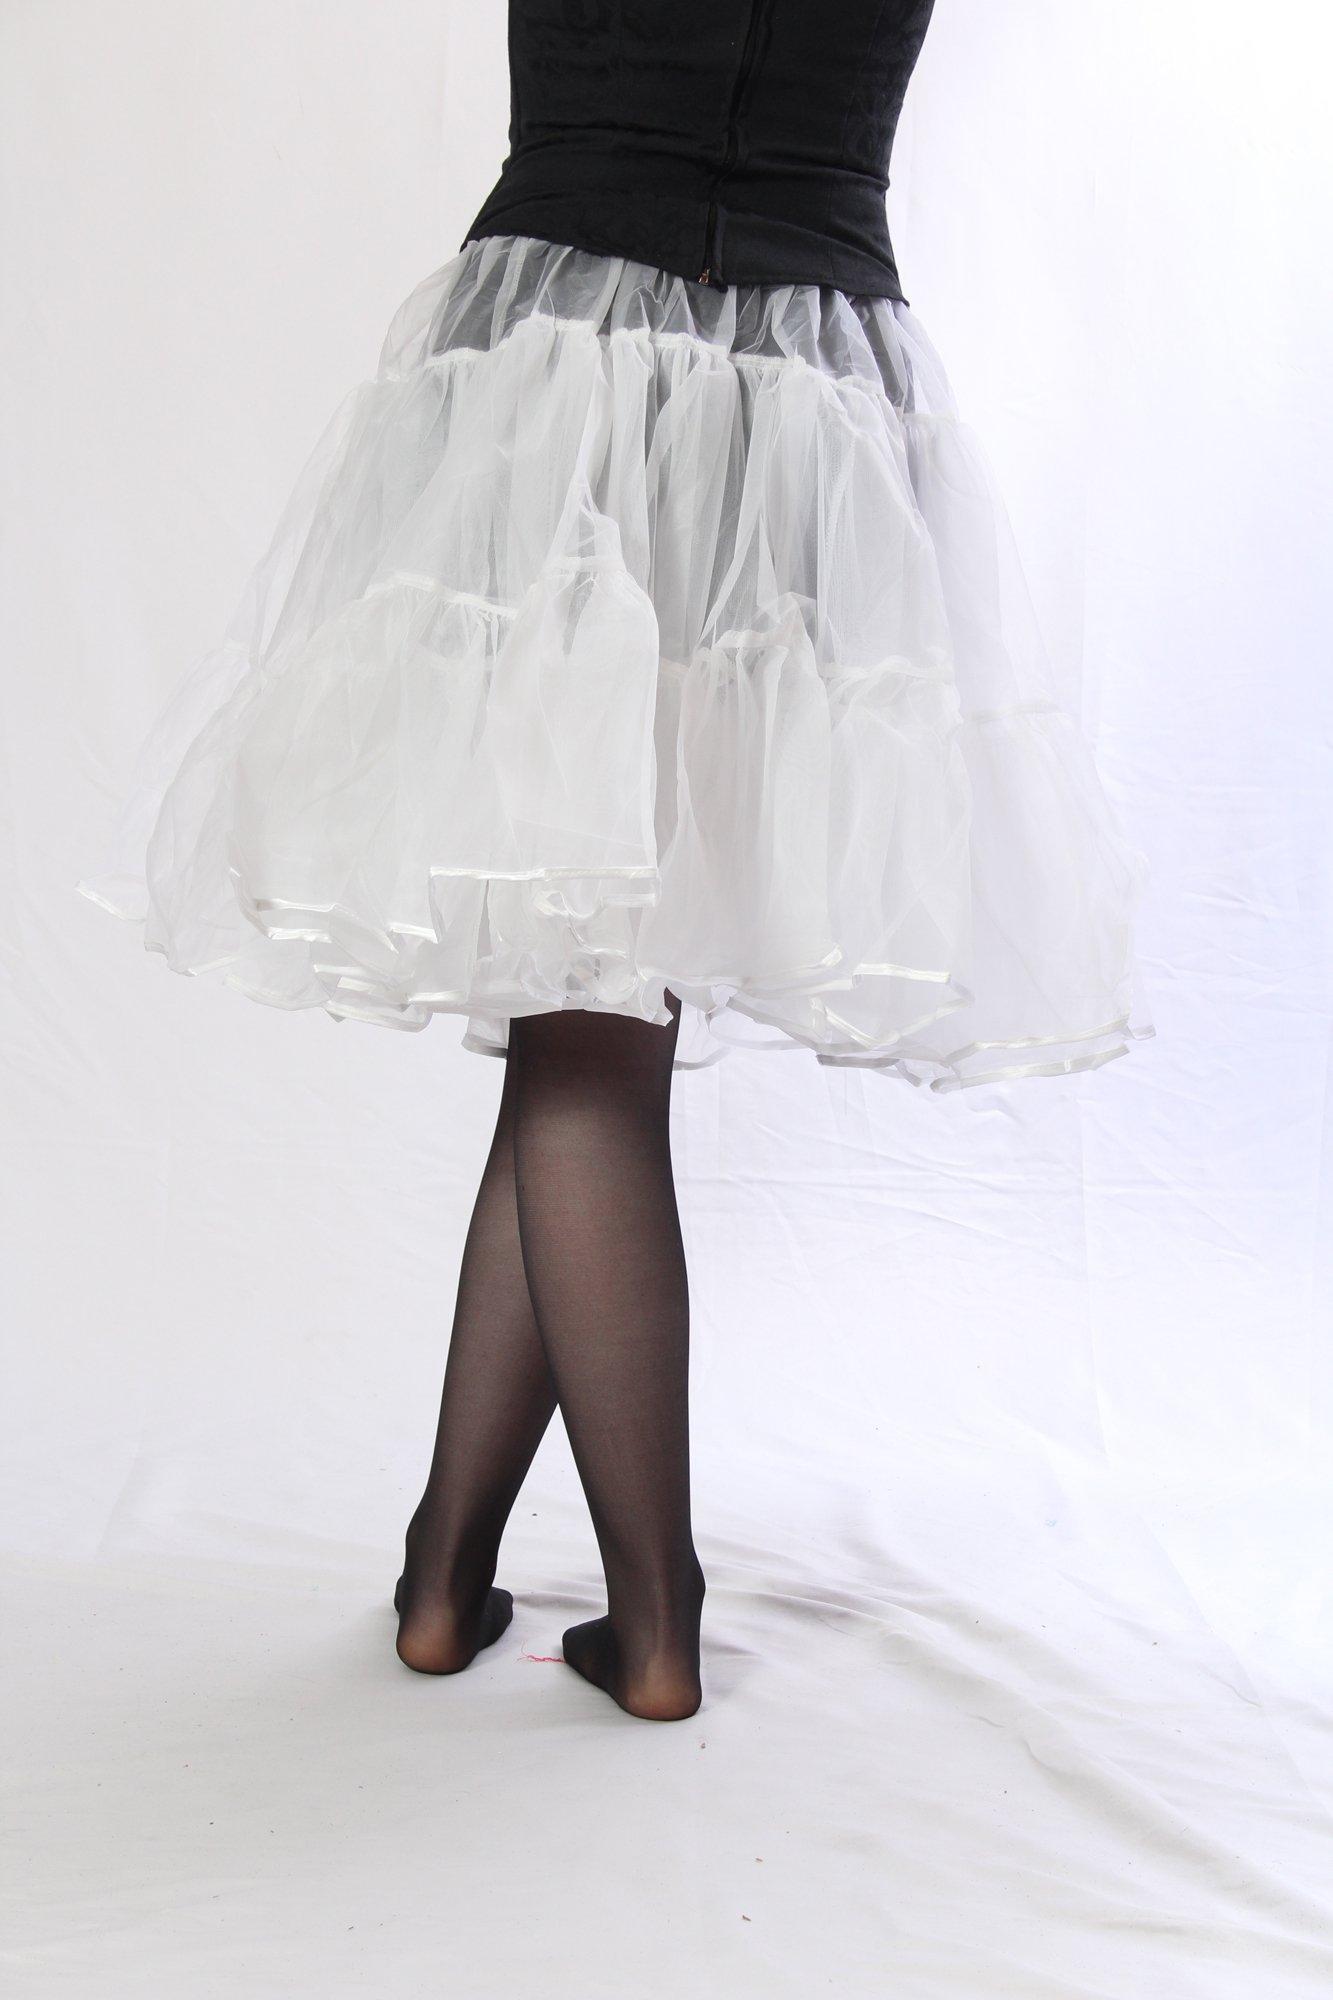 Petticoat Crinoline. Perfect Petticoat Skirt for Vintage Dresses, Petticoat Dresses, Poodle Skirts as Rockabilly Adult Tutu Skirt. Tulle Fabric; 22' Length - White Petticoat by BellaSous (Image #3)